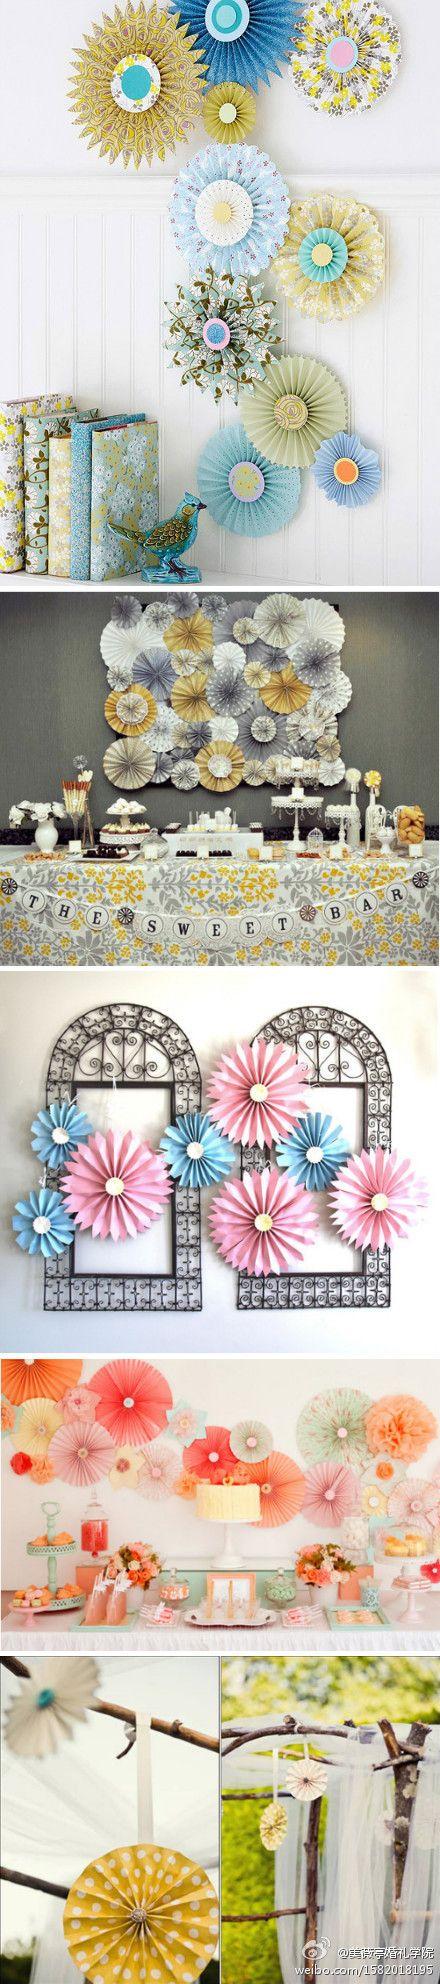 : # DIY #  ideas creativedecoration